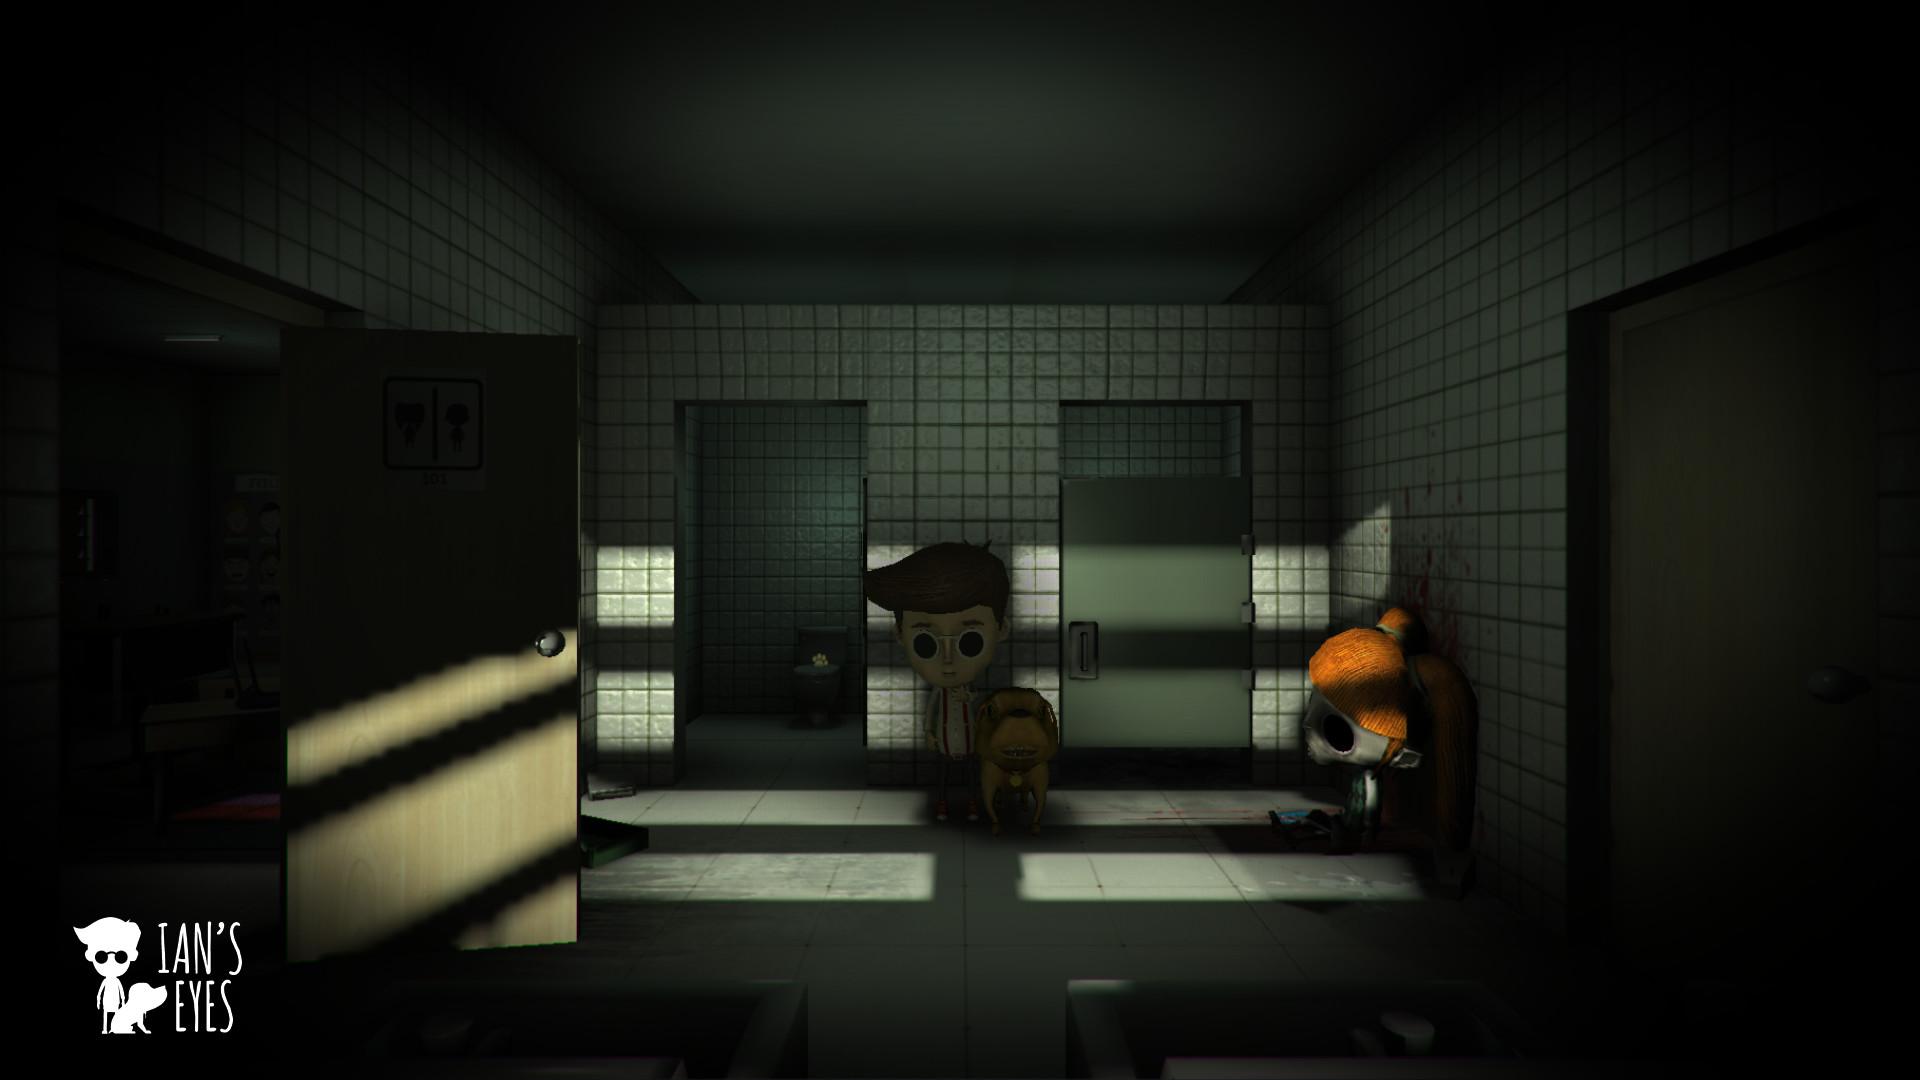 ians-eyes-review-screenshot-1